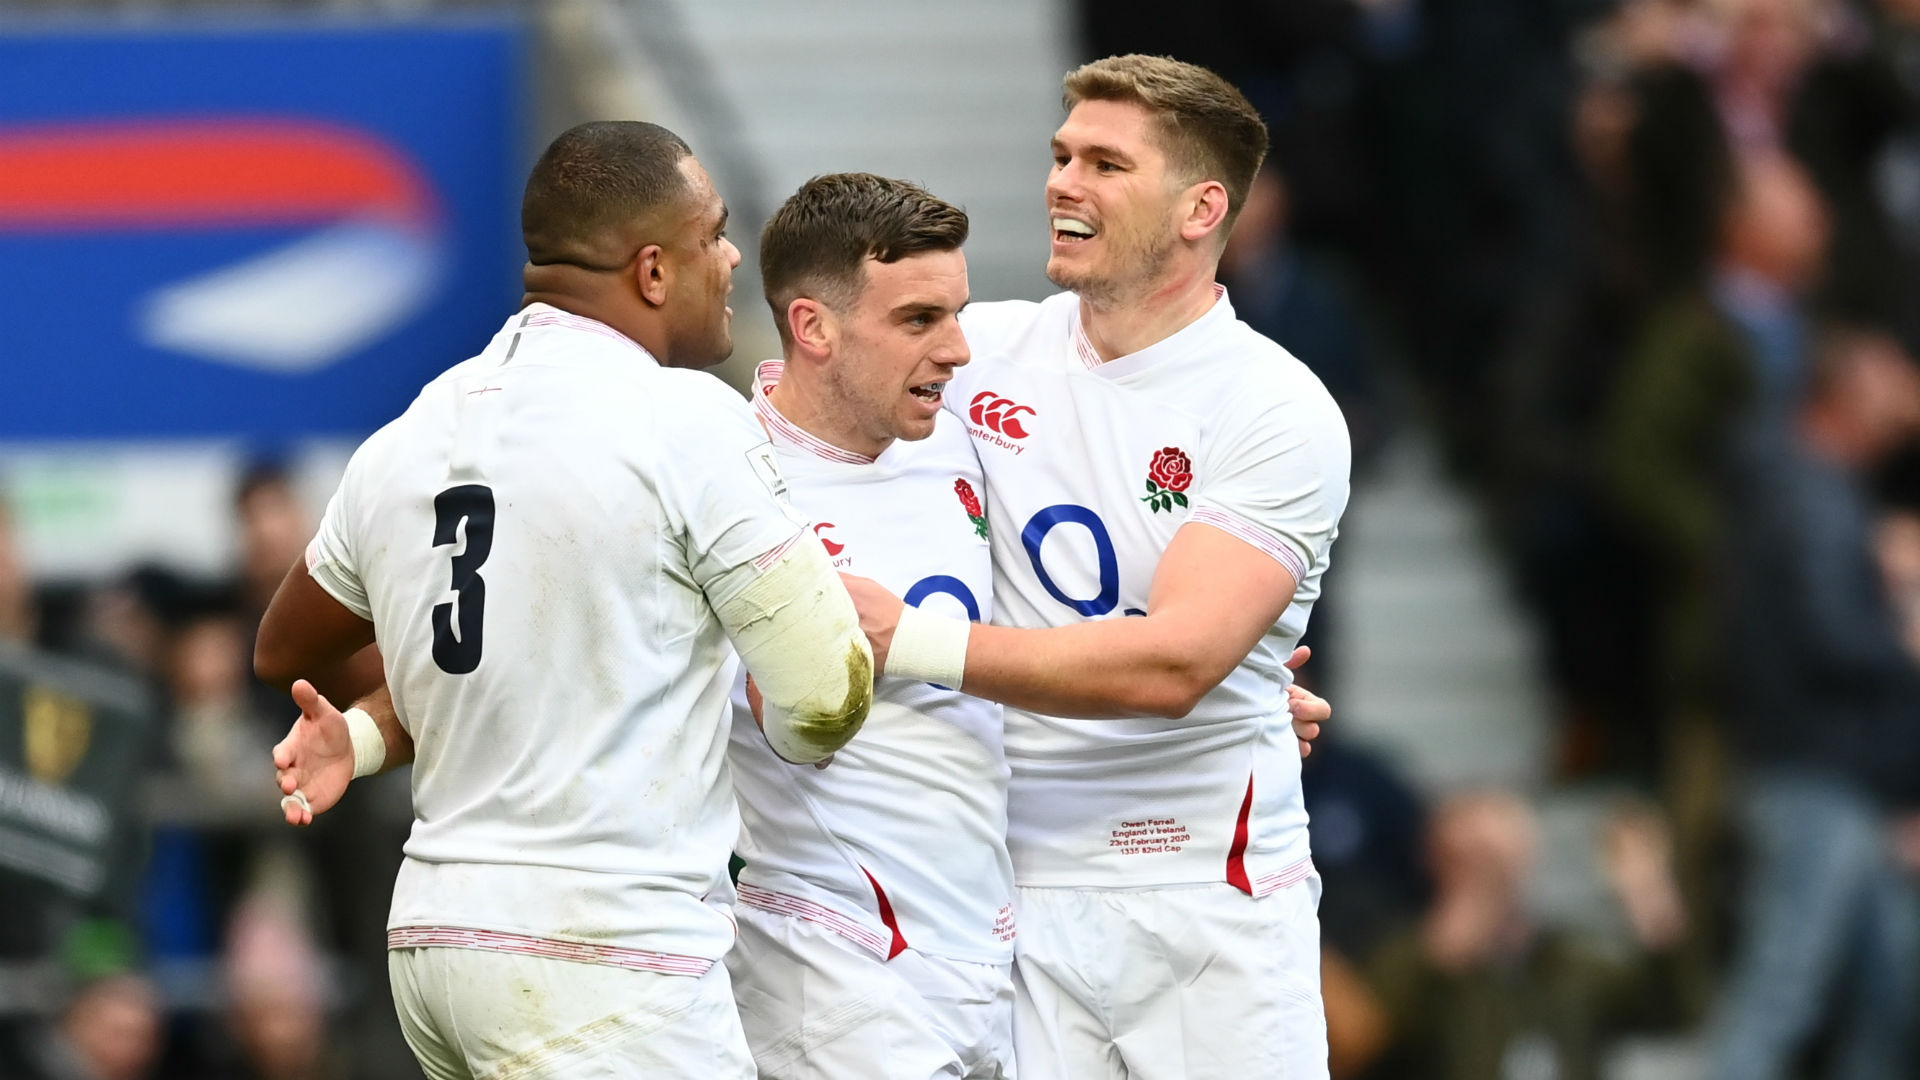 Six Nations 2020: England 24-12 Ireland